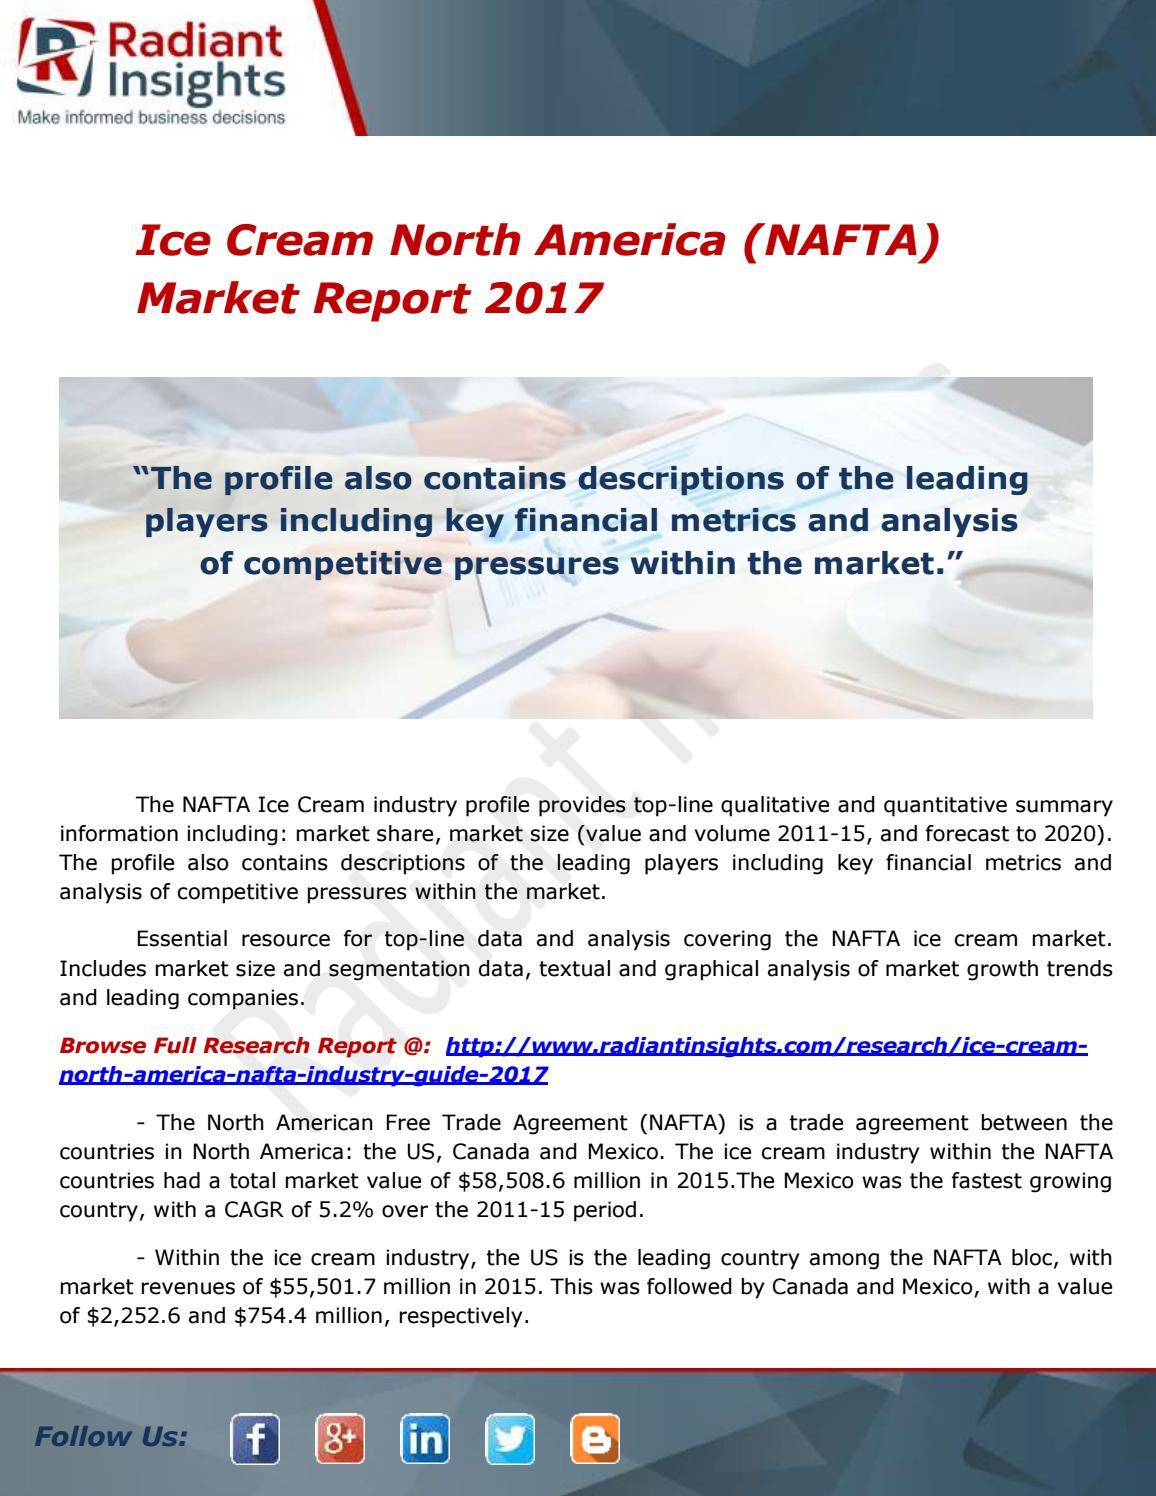 Ice Cream North America Nafta Industry Report 2017 By